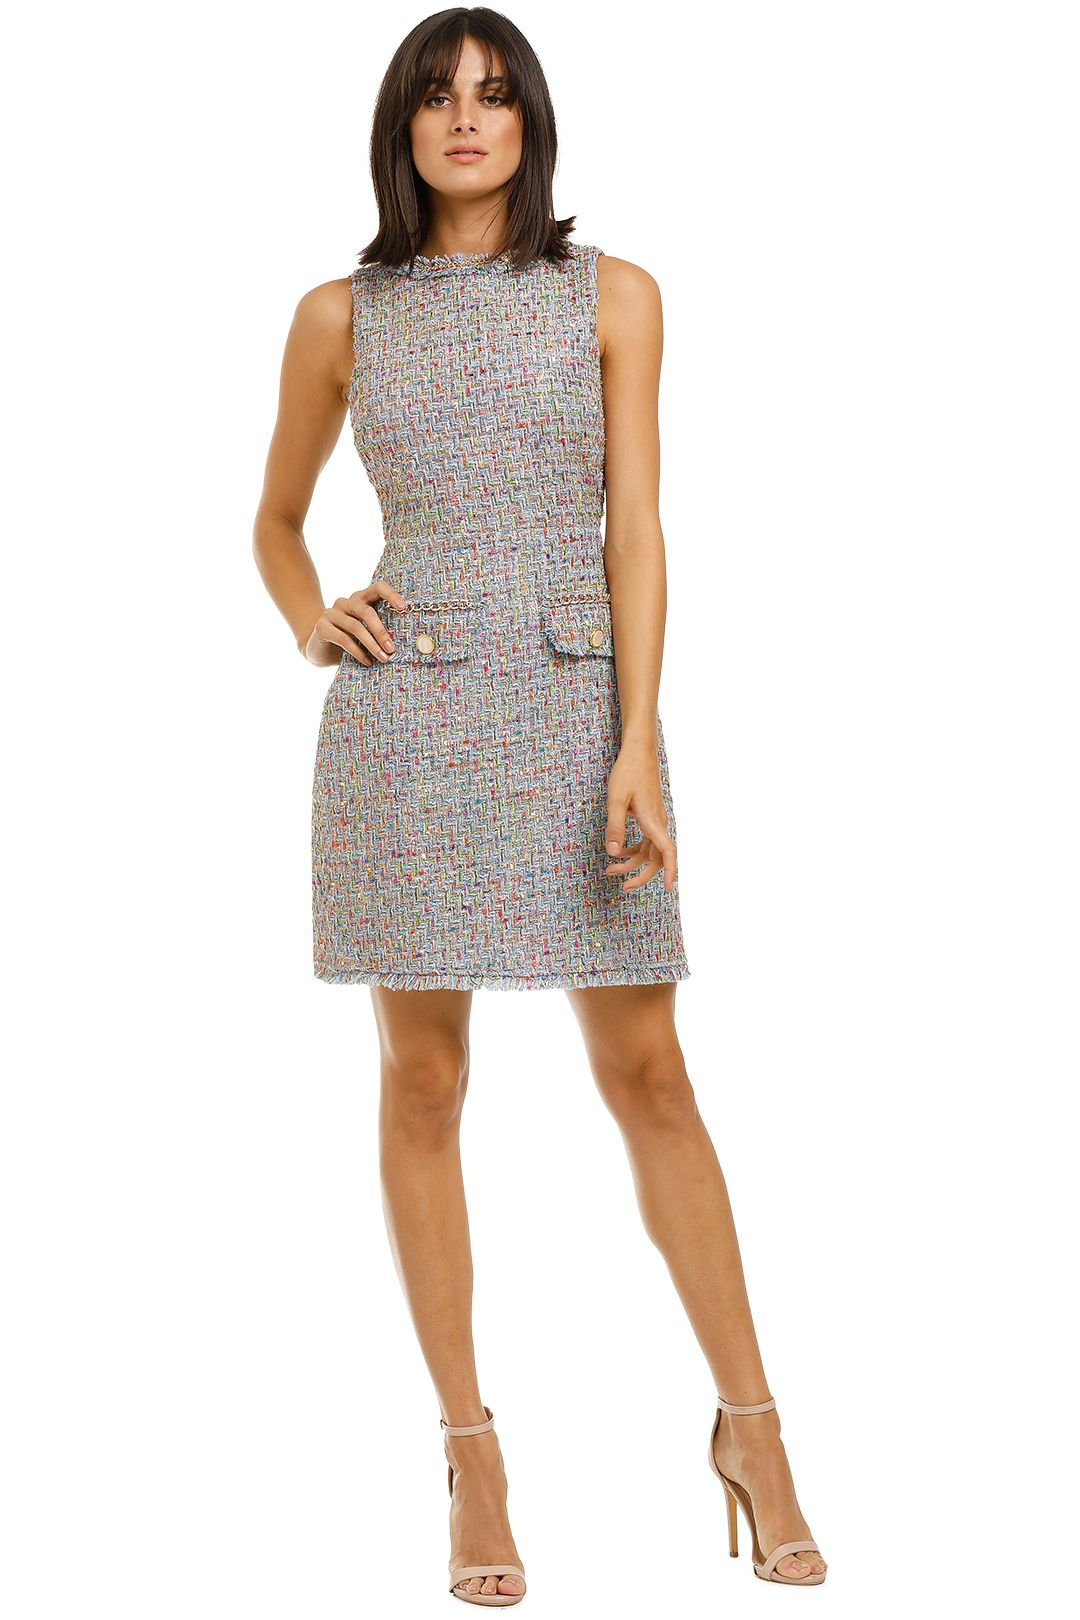 Alexia-Admor-Klara-Tweed-Dress-Sky-Blue-Front